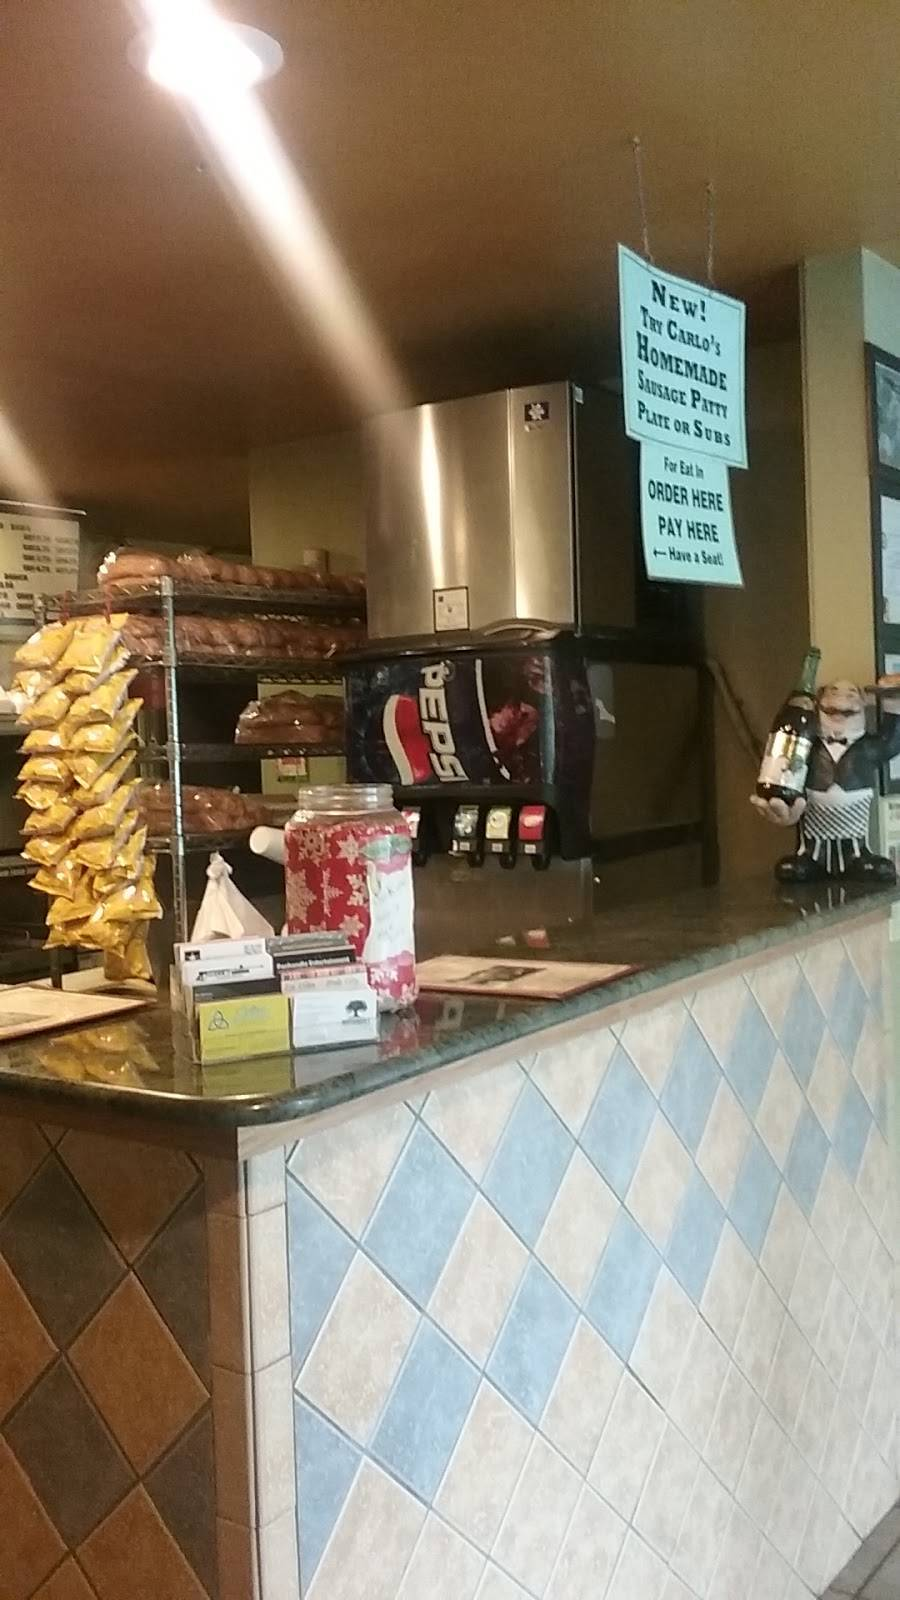 Philly Cheese Steak Plus   restaurant   4150 Hedgesville Rd, Hedgesville, WV 25427, USA   3047540104 OR +1 304-754-0104